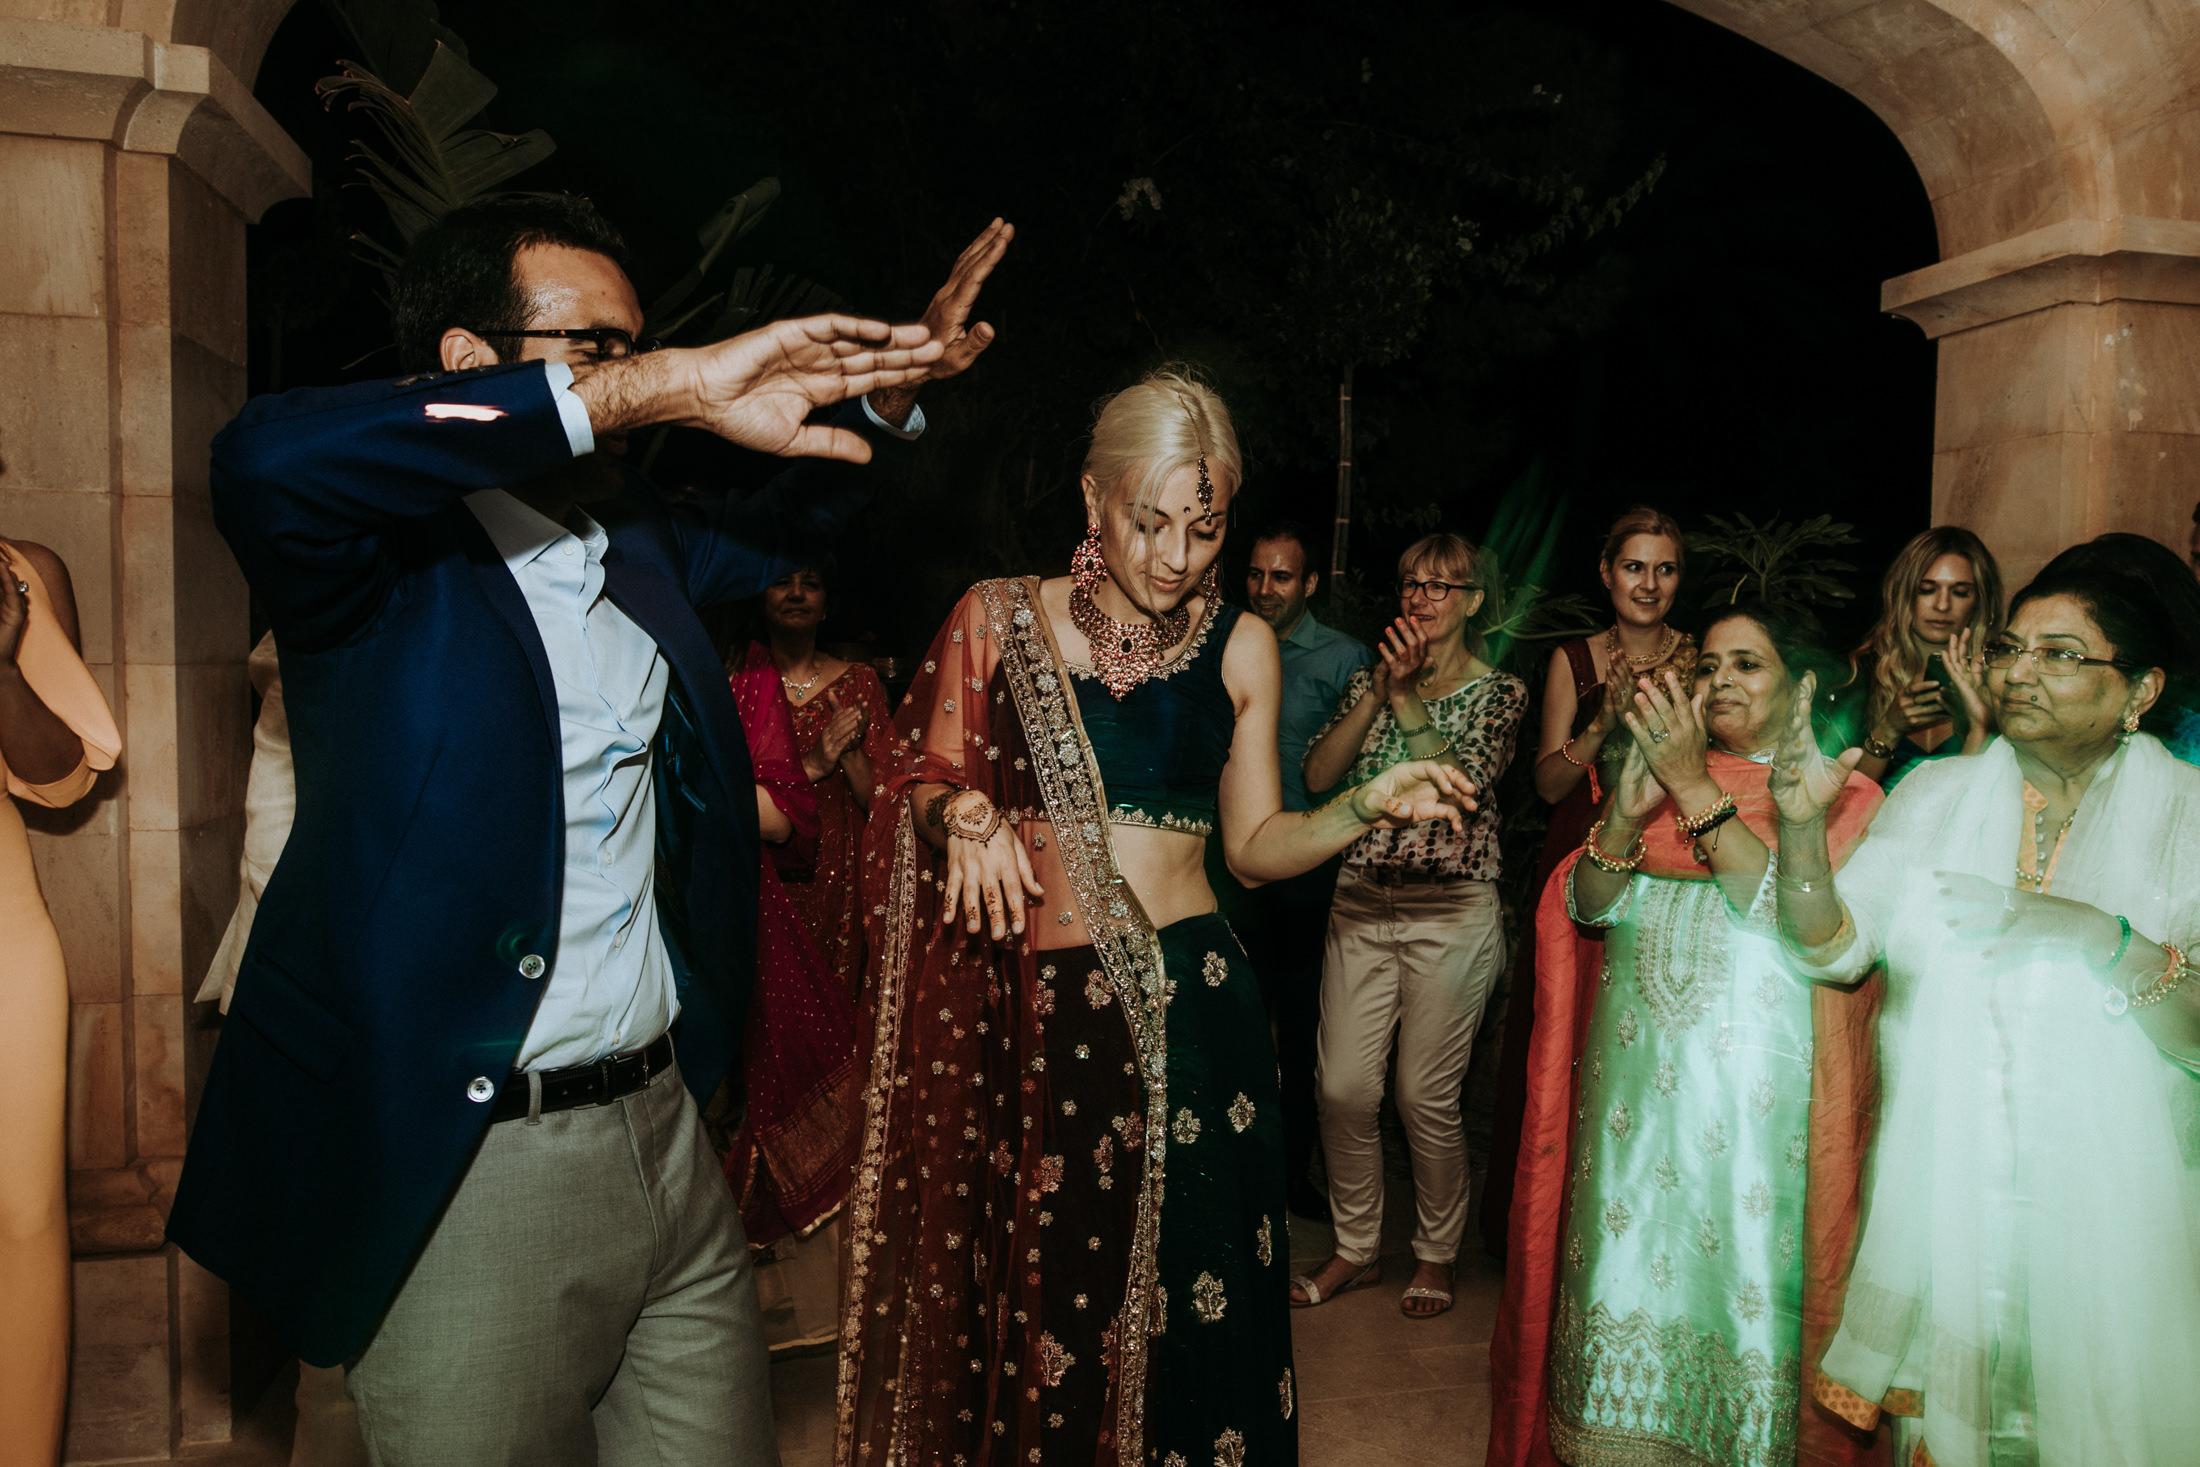 Wedding_Photographer_Mallorca_Daniela-Marquardt_Photography_New_York_Iceland_Tuscany_Santorini_Portugal_Austria_Bavaria_Elopement_Hochzeitsfotograf_AntjeRajat1_67